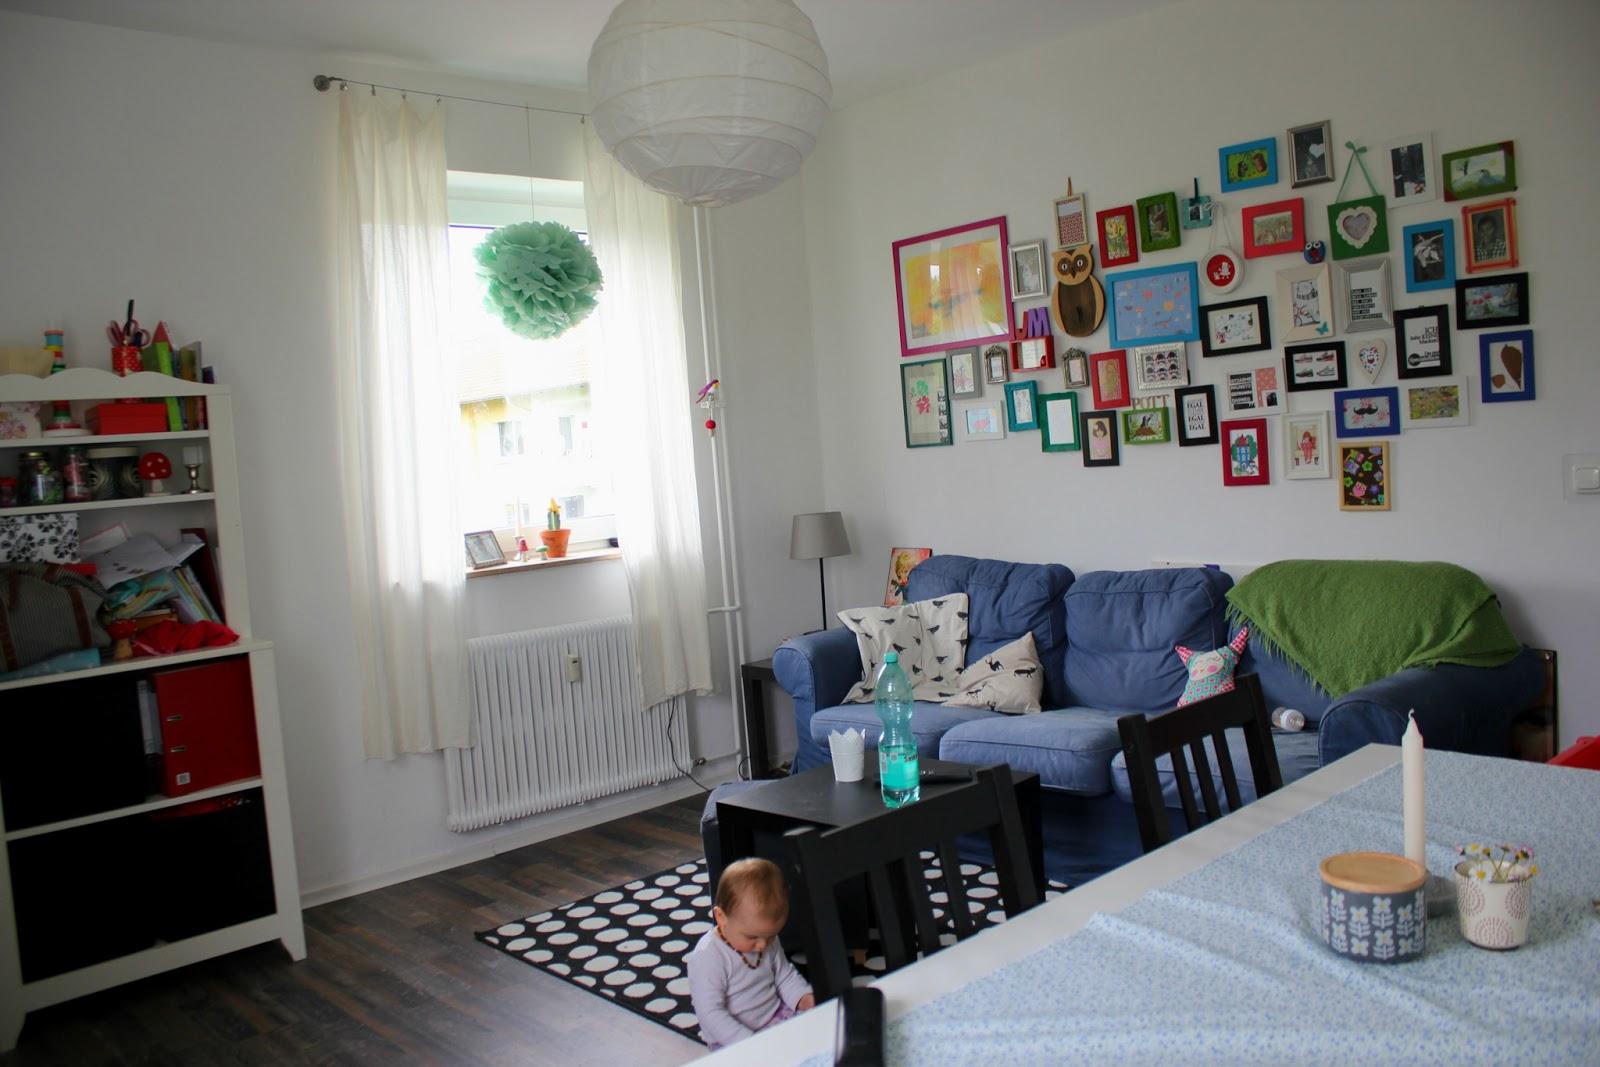 tatii talentlos mein geliebtes zuhause. Black Bedroom Furniture Sets. Home Design Ideas